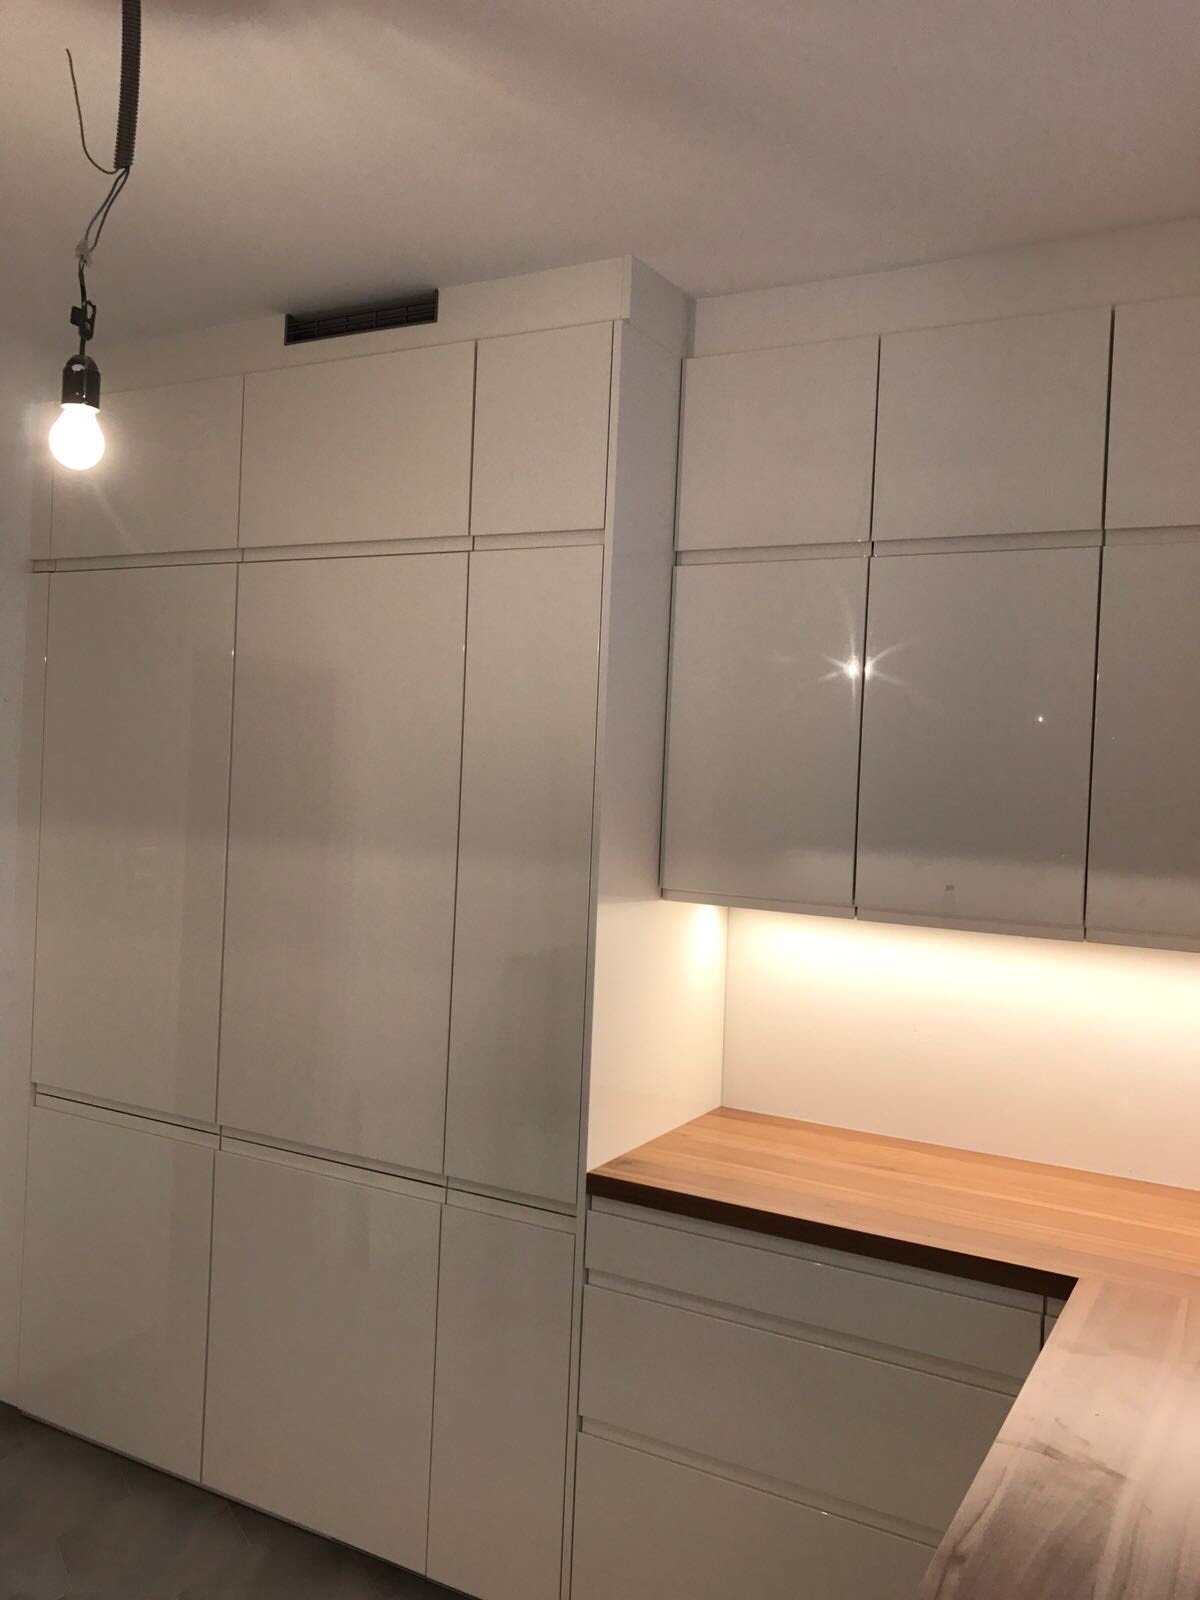 IRTS Gruppe | Möbelmontage- Küchenmontage - Ladenbaumontage ... | {Küchenmontage 29}